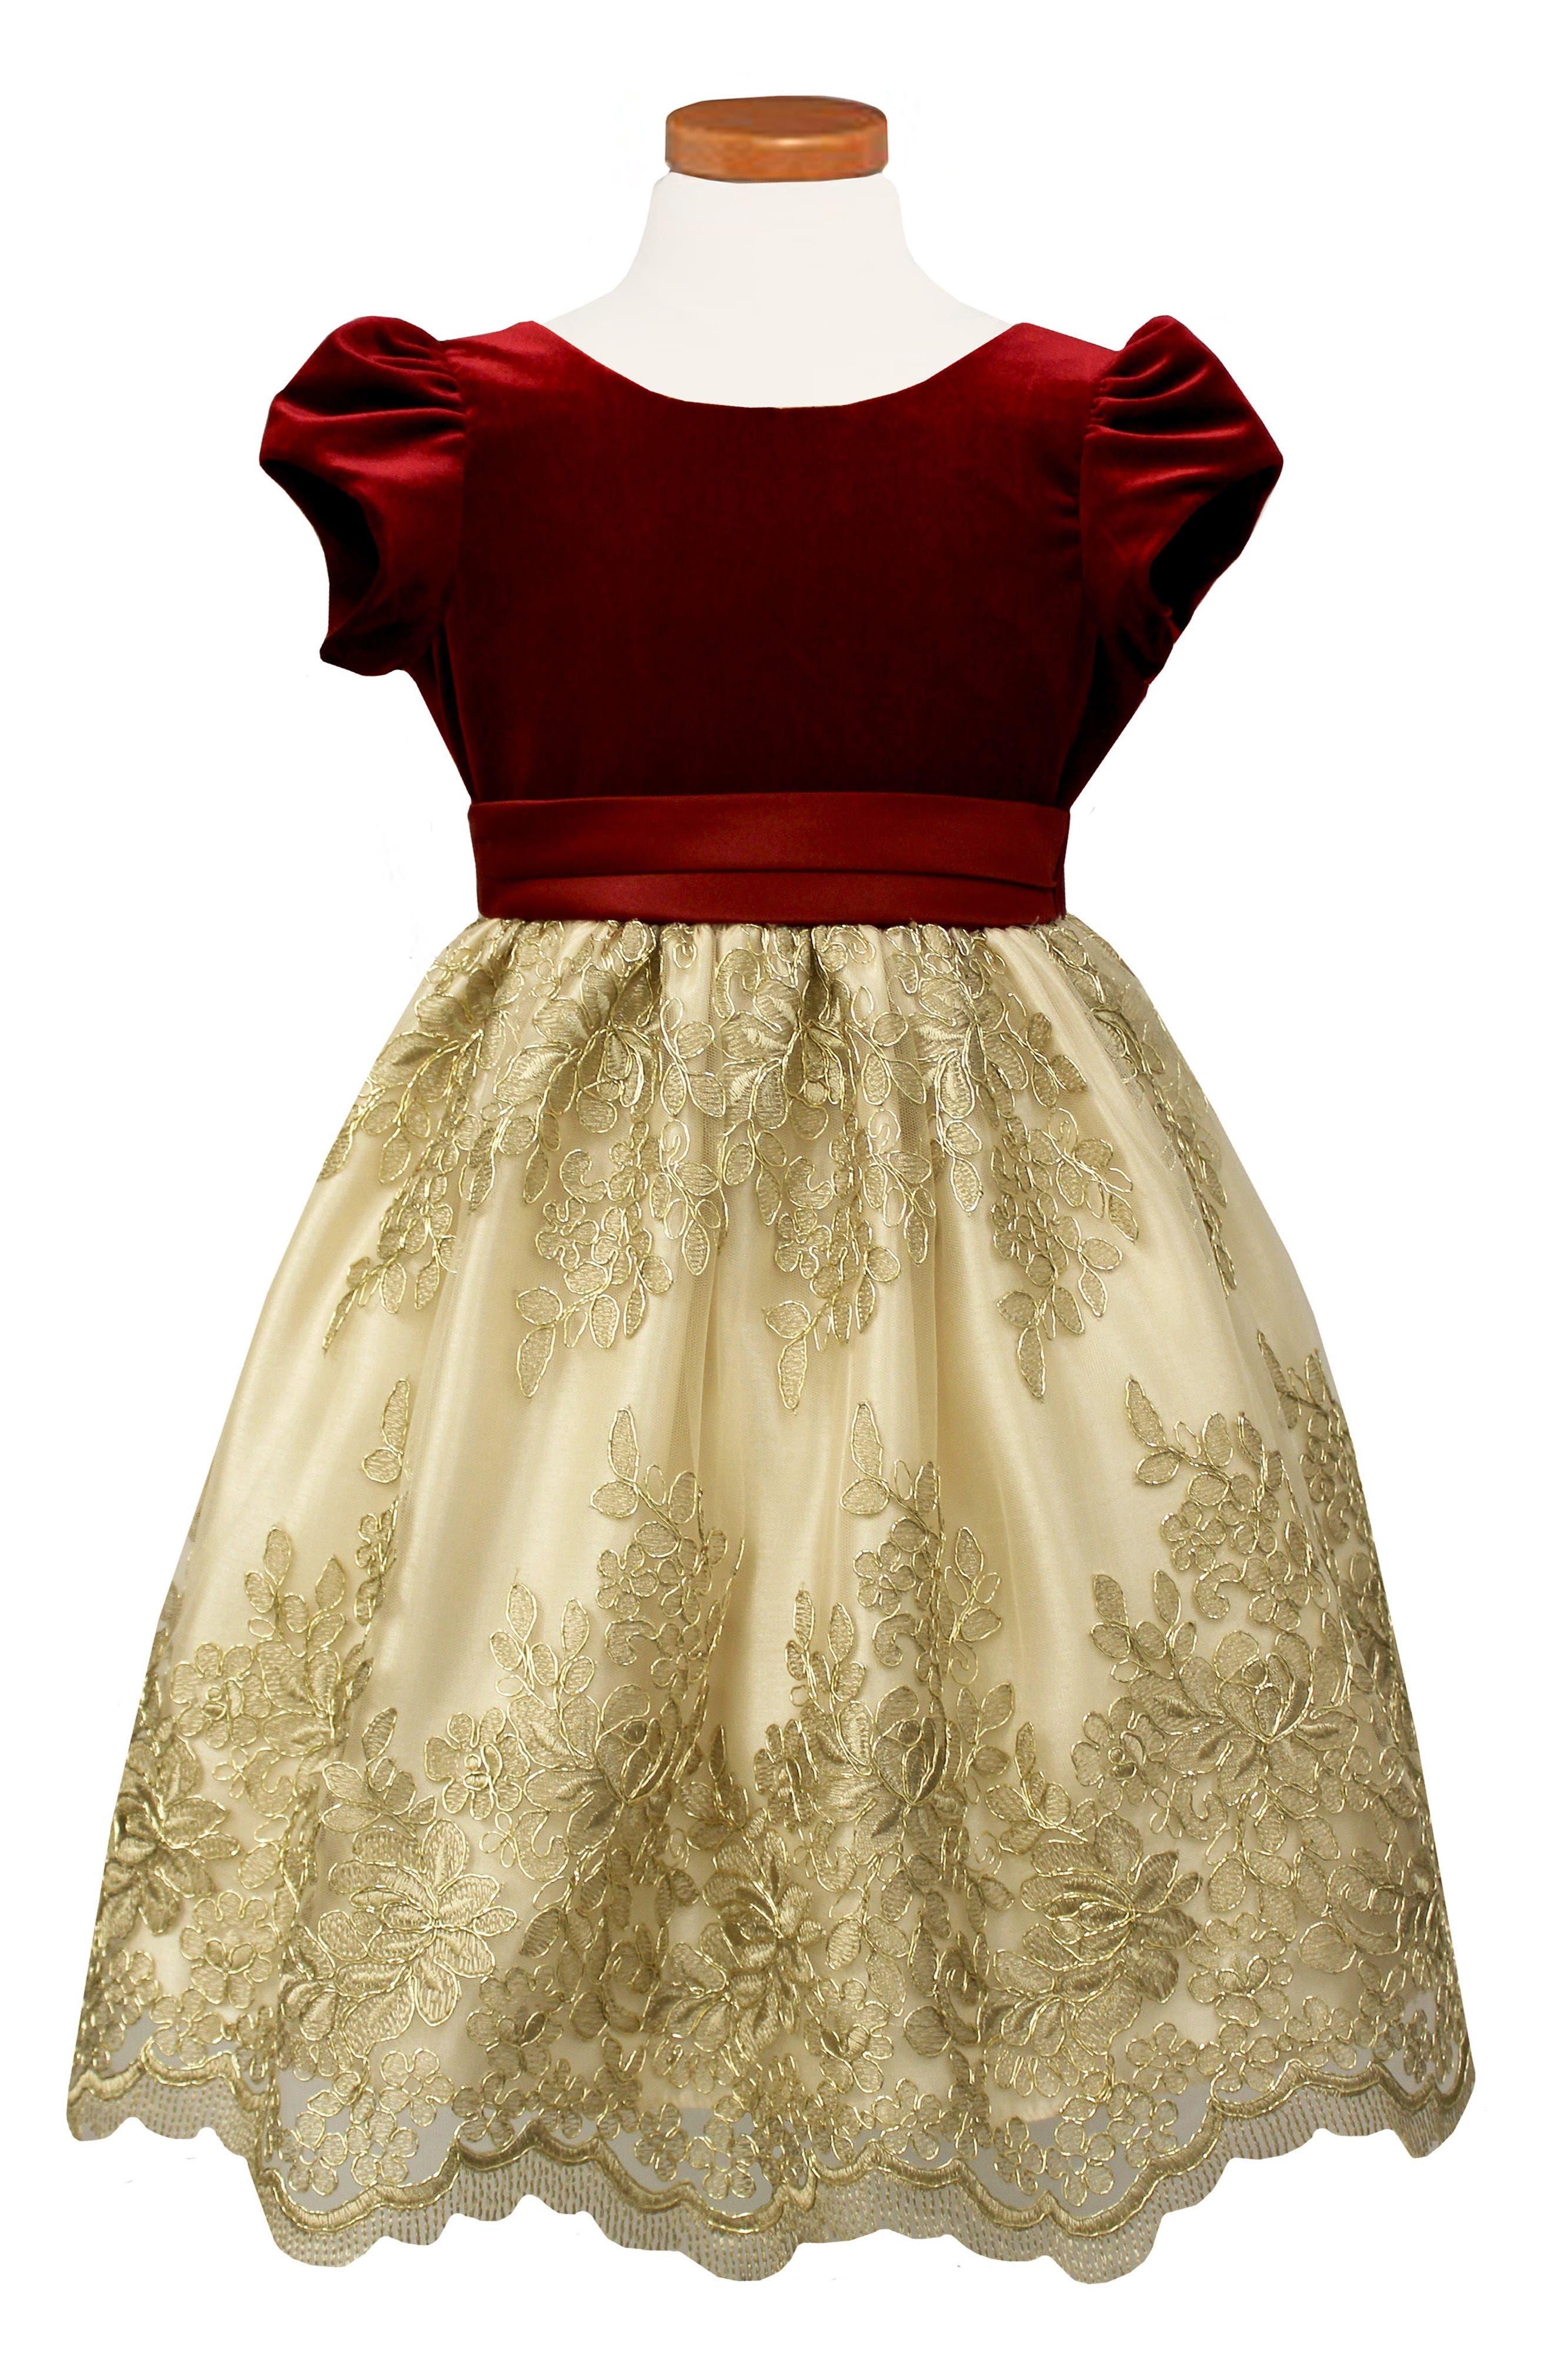 Sorbet Floral Embroidered Party Dress (Toddler Girls & Little Girls)